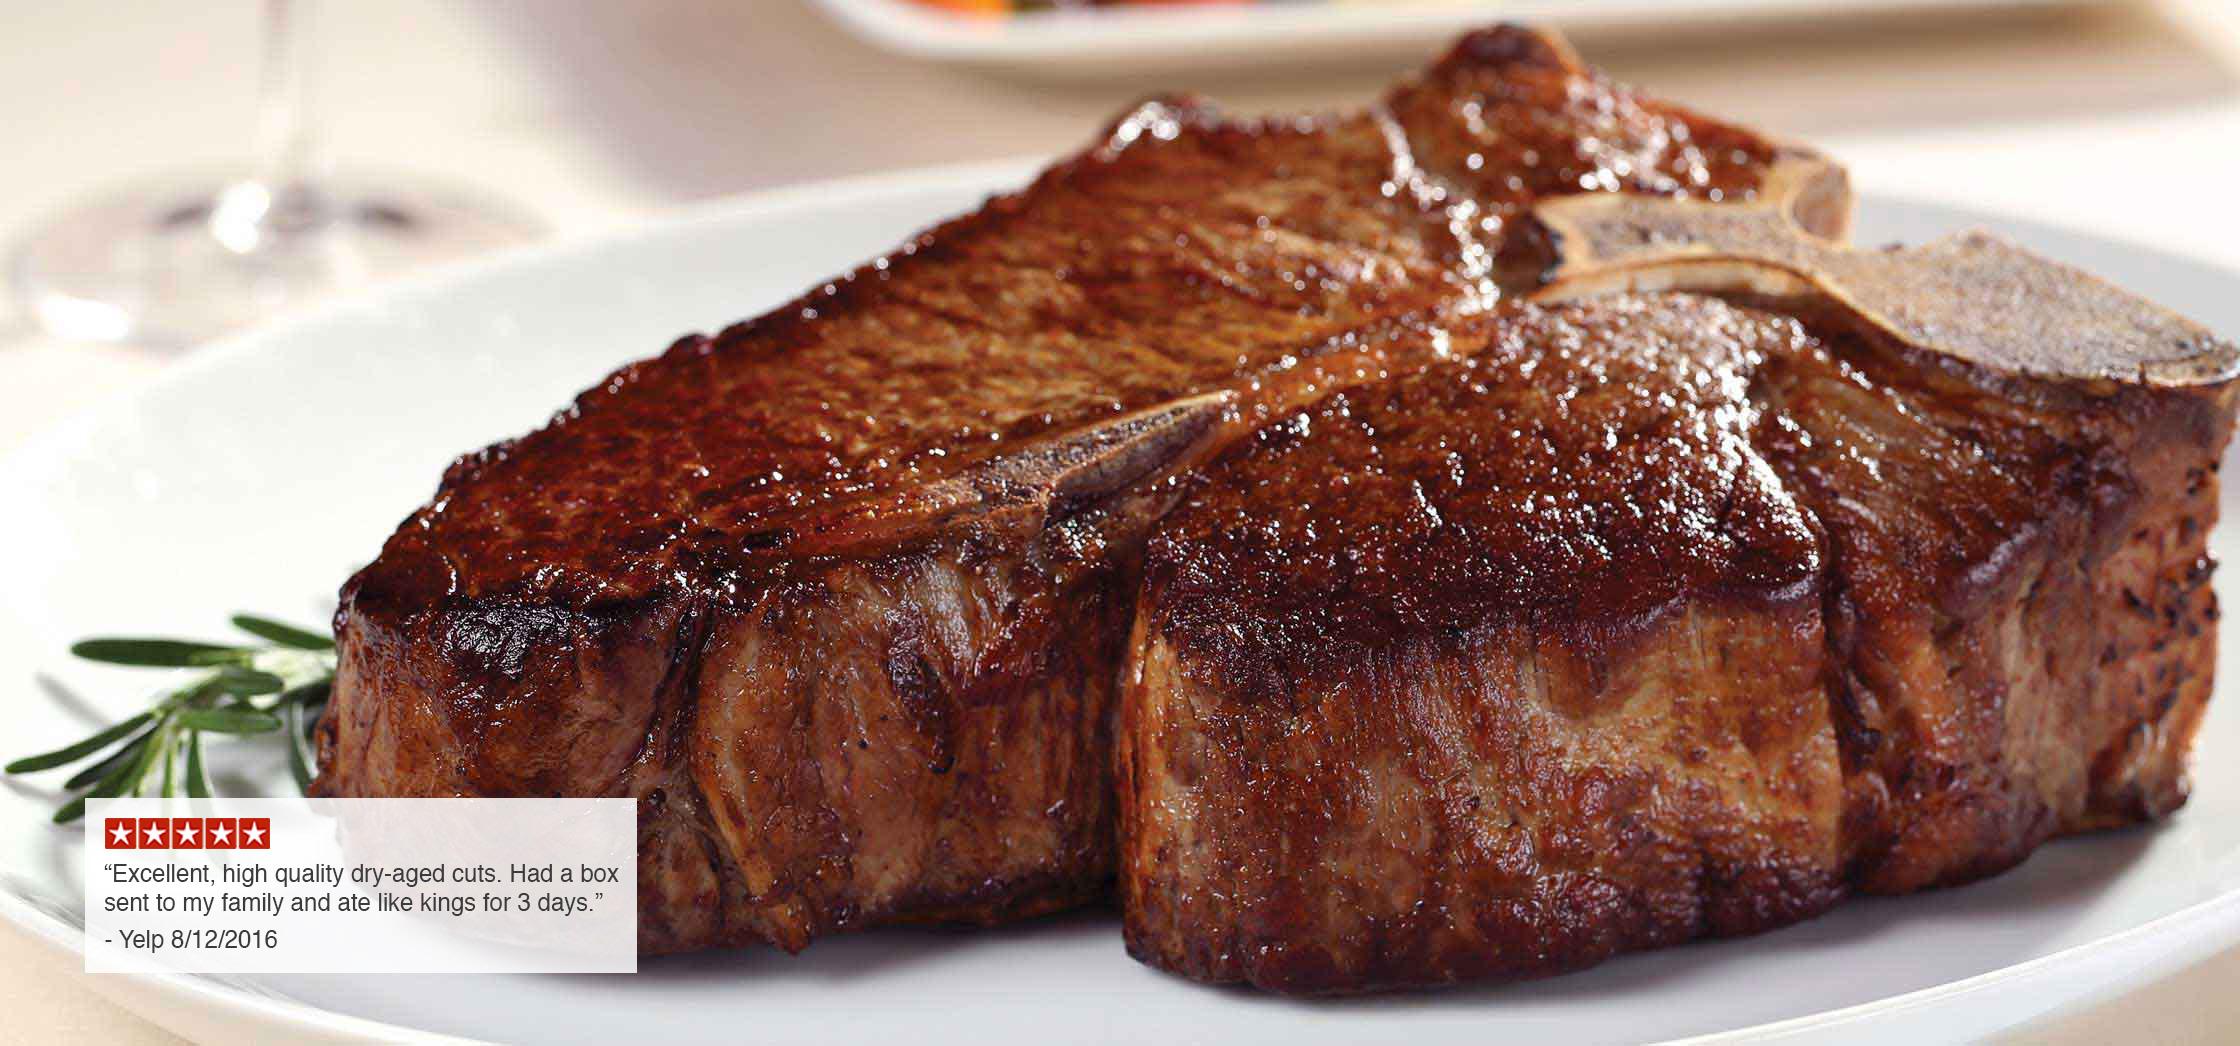 Steakhouse De Suprema Calidad